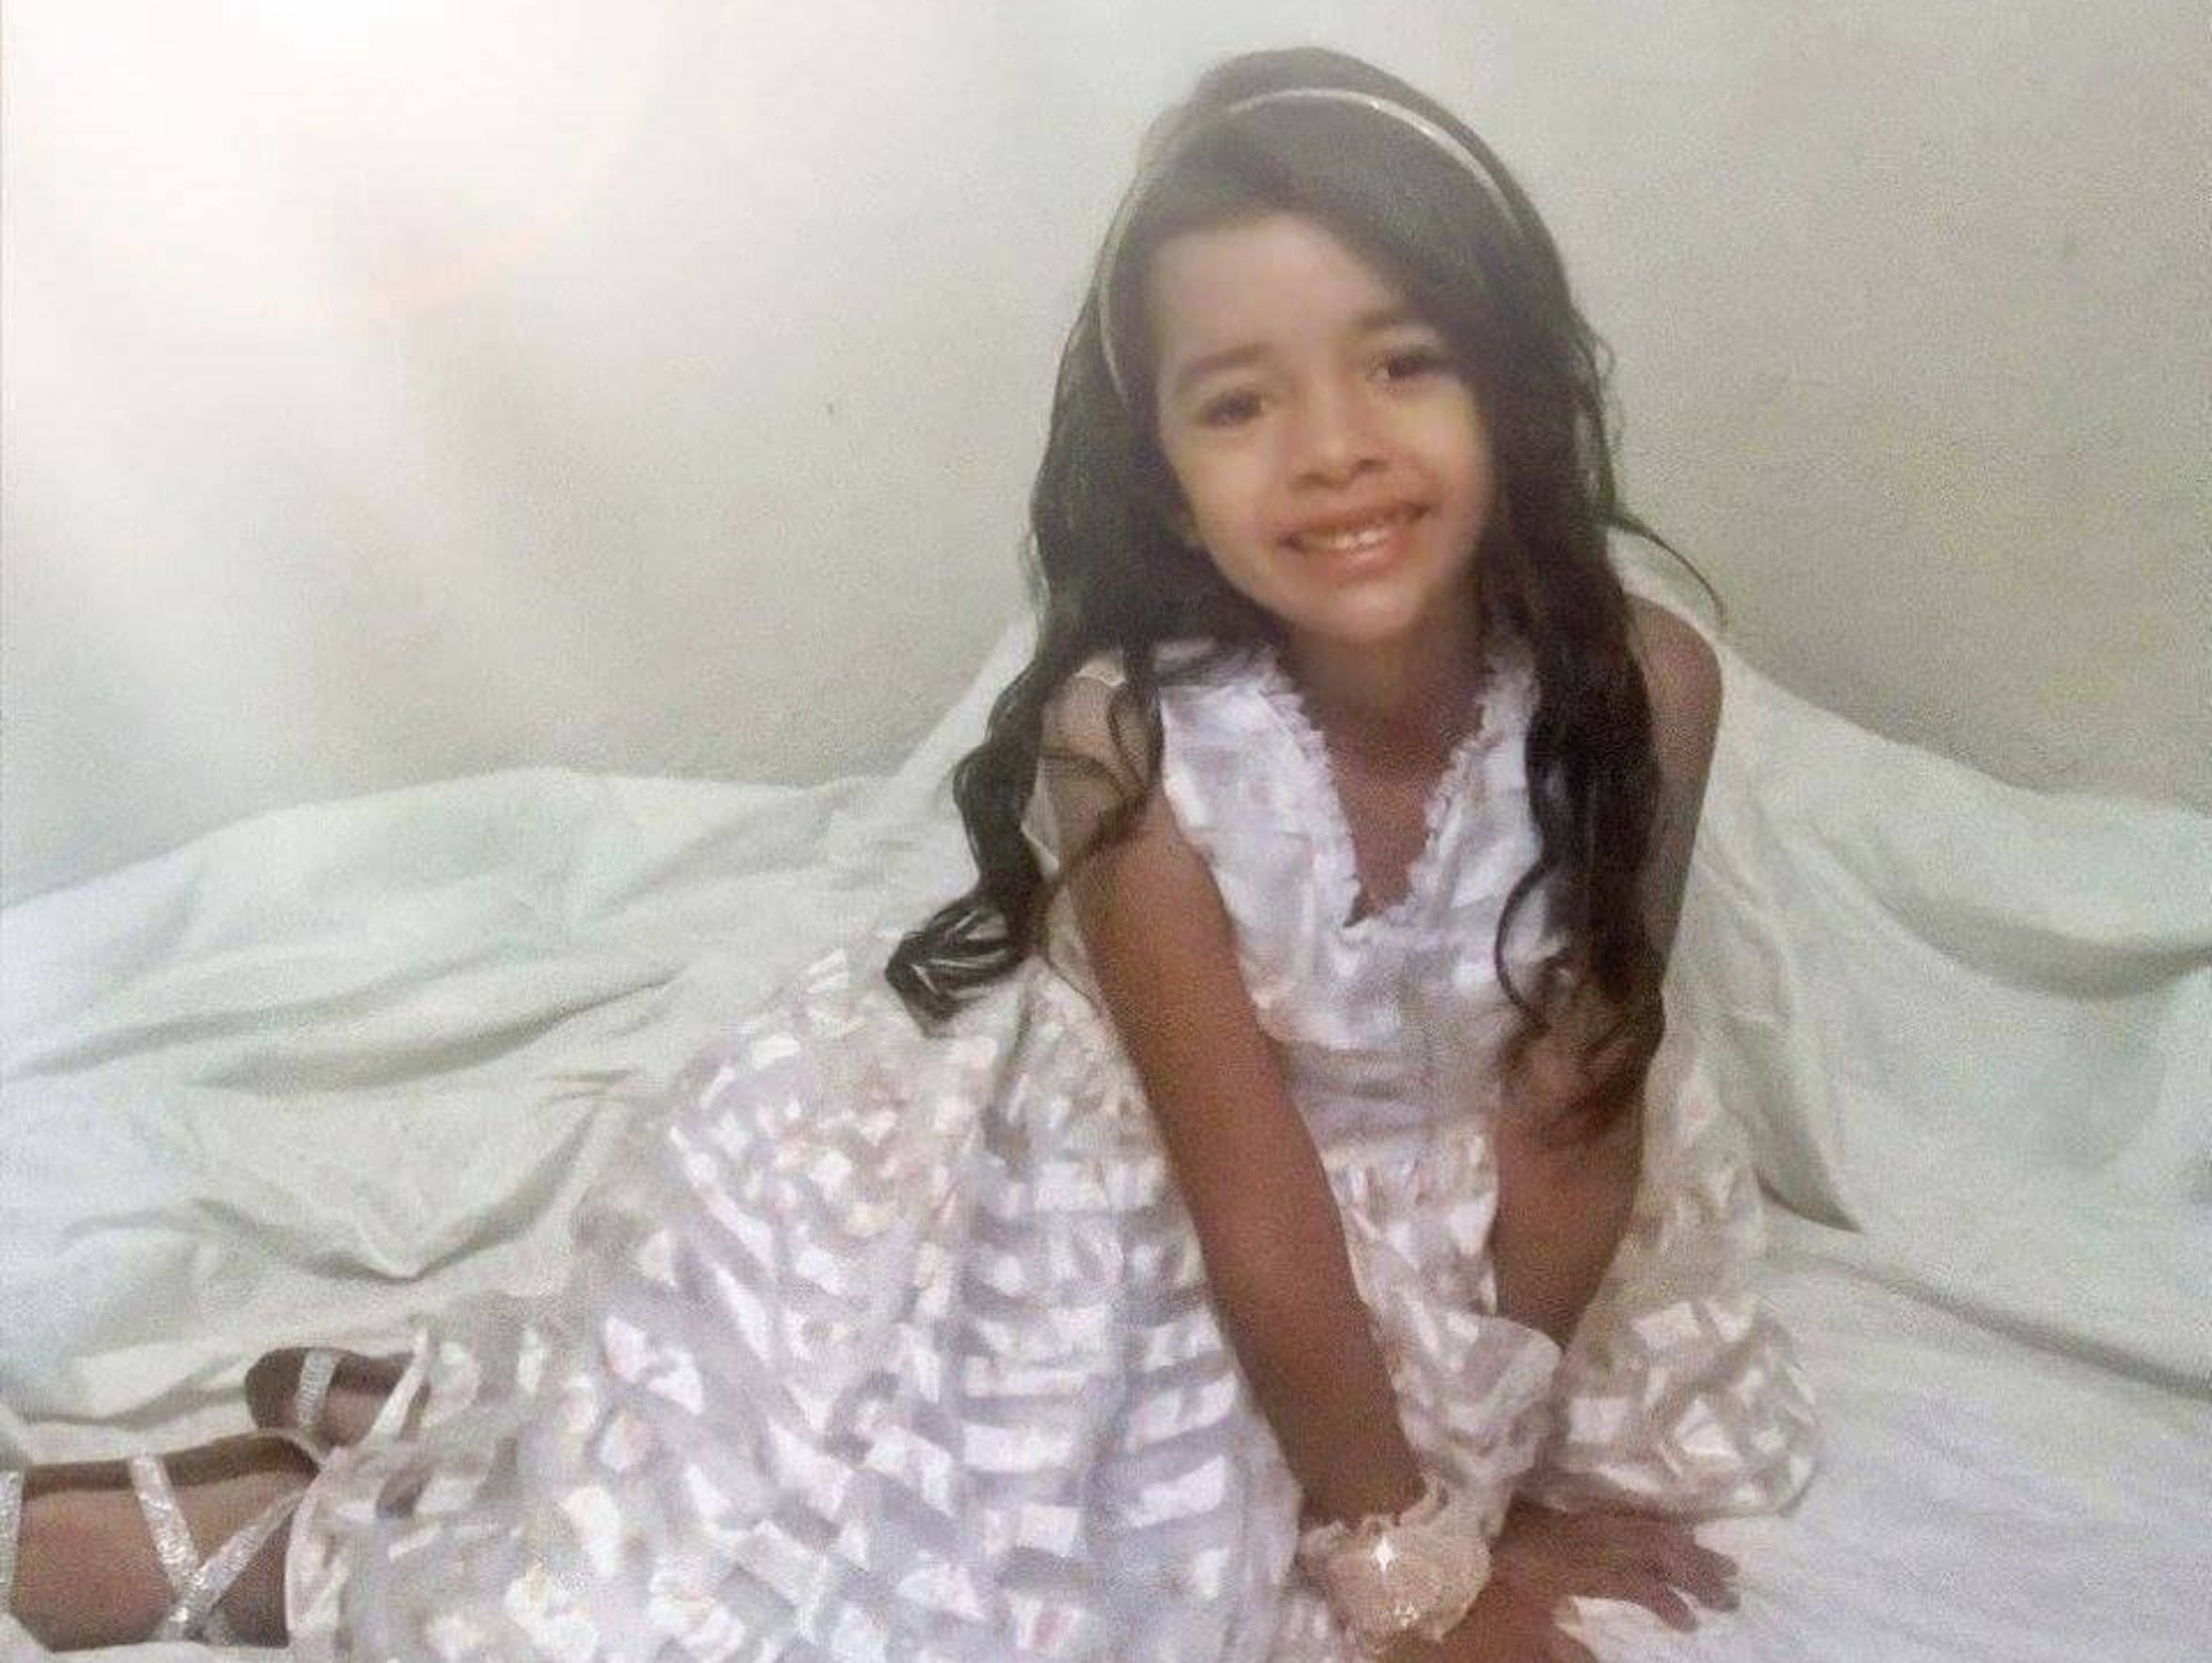 Alisson Ximena Valencia Madrid, 6, was heard pleading